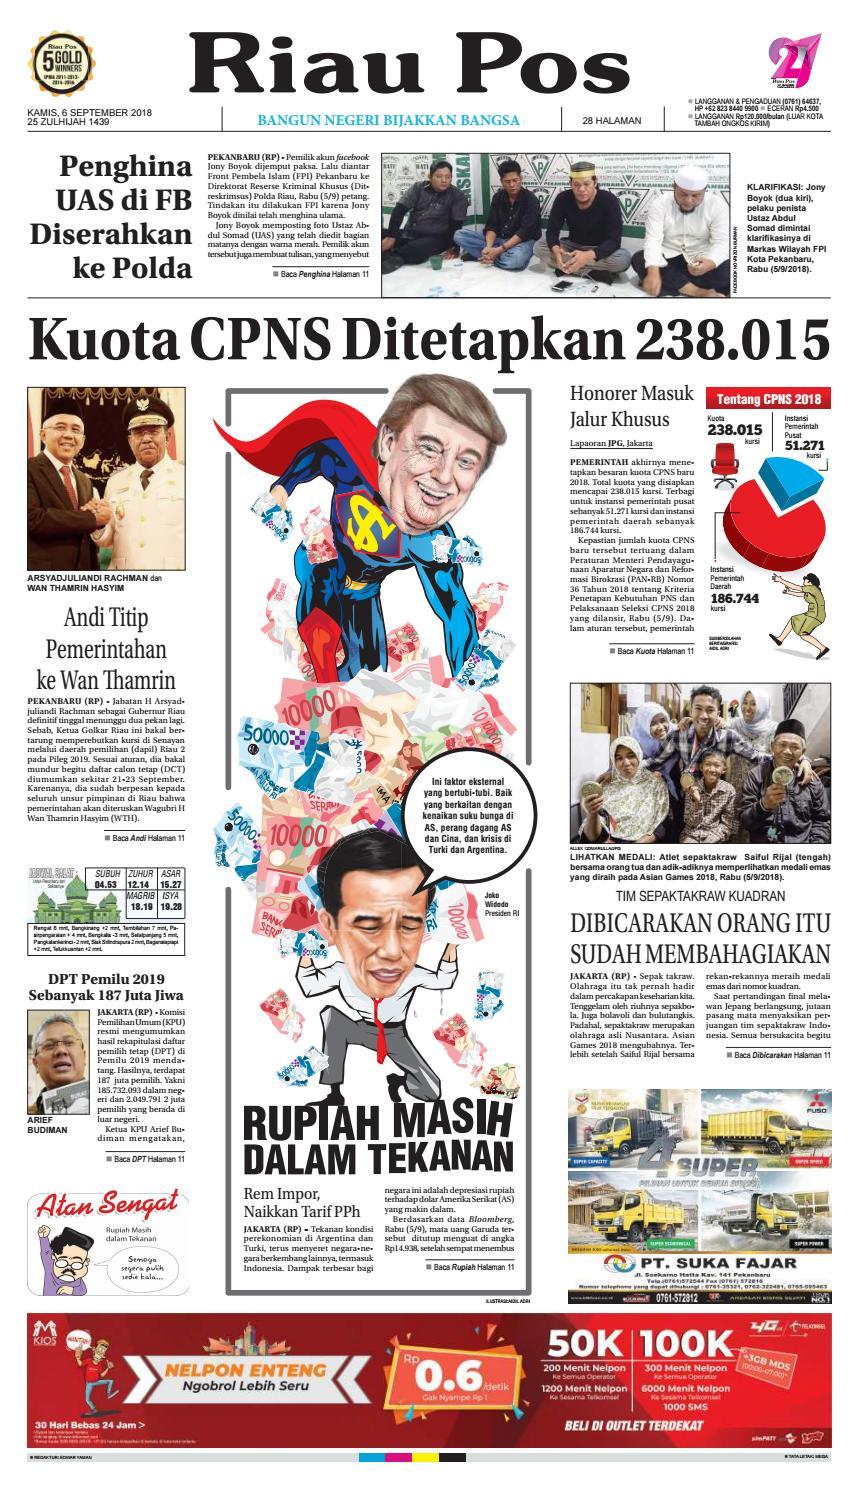 Riau Pos Edisi 6 September 2018 By Issuu Produk Ukm Bumn Tempat Tisu Handmade Trenggalek